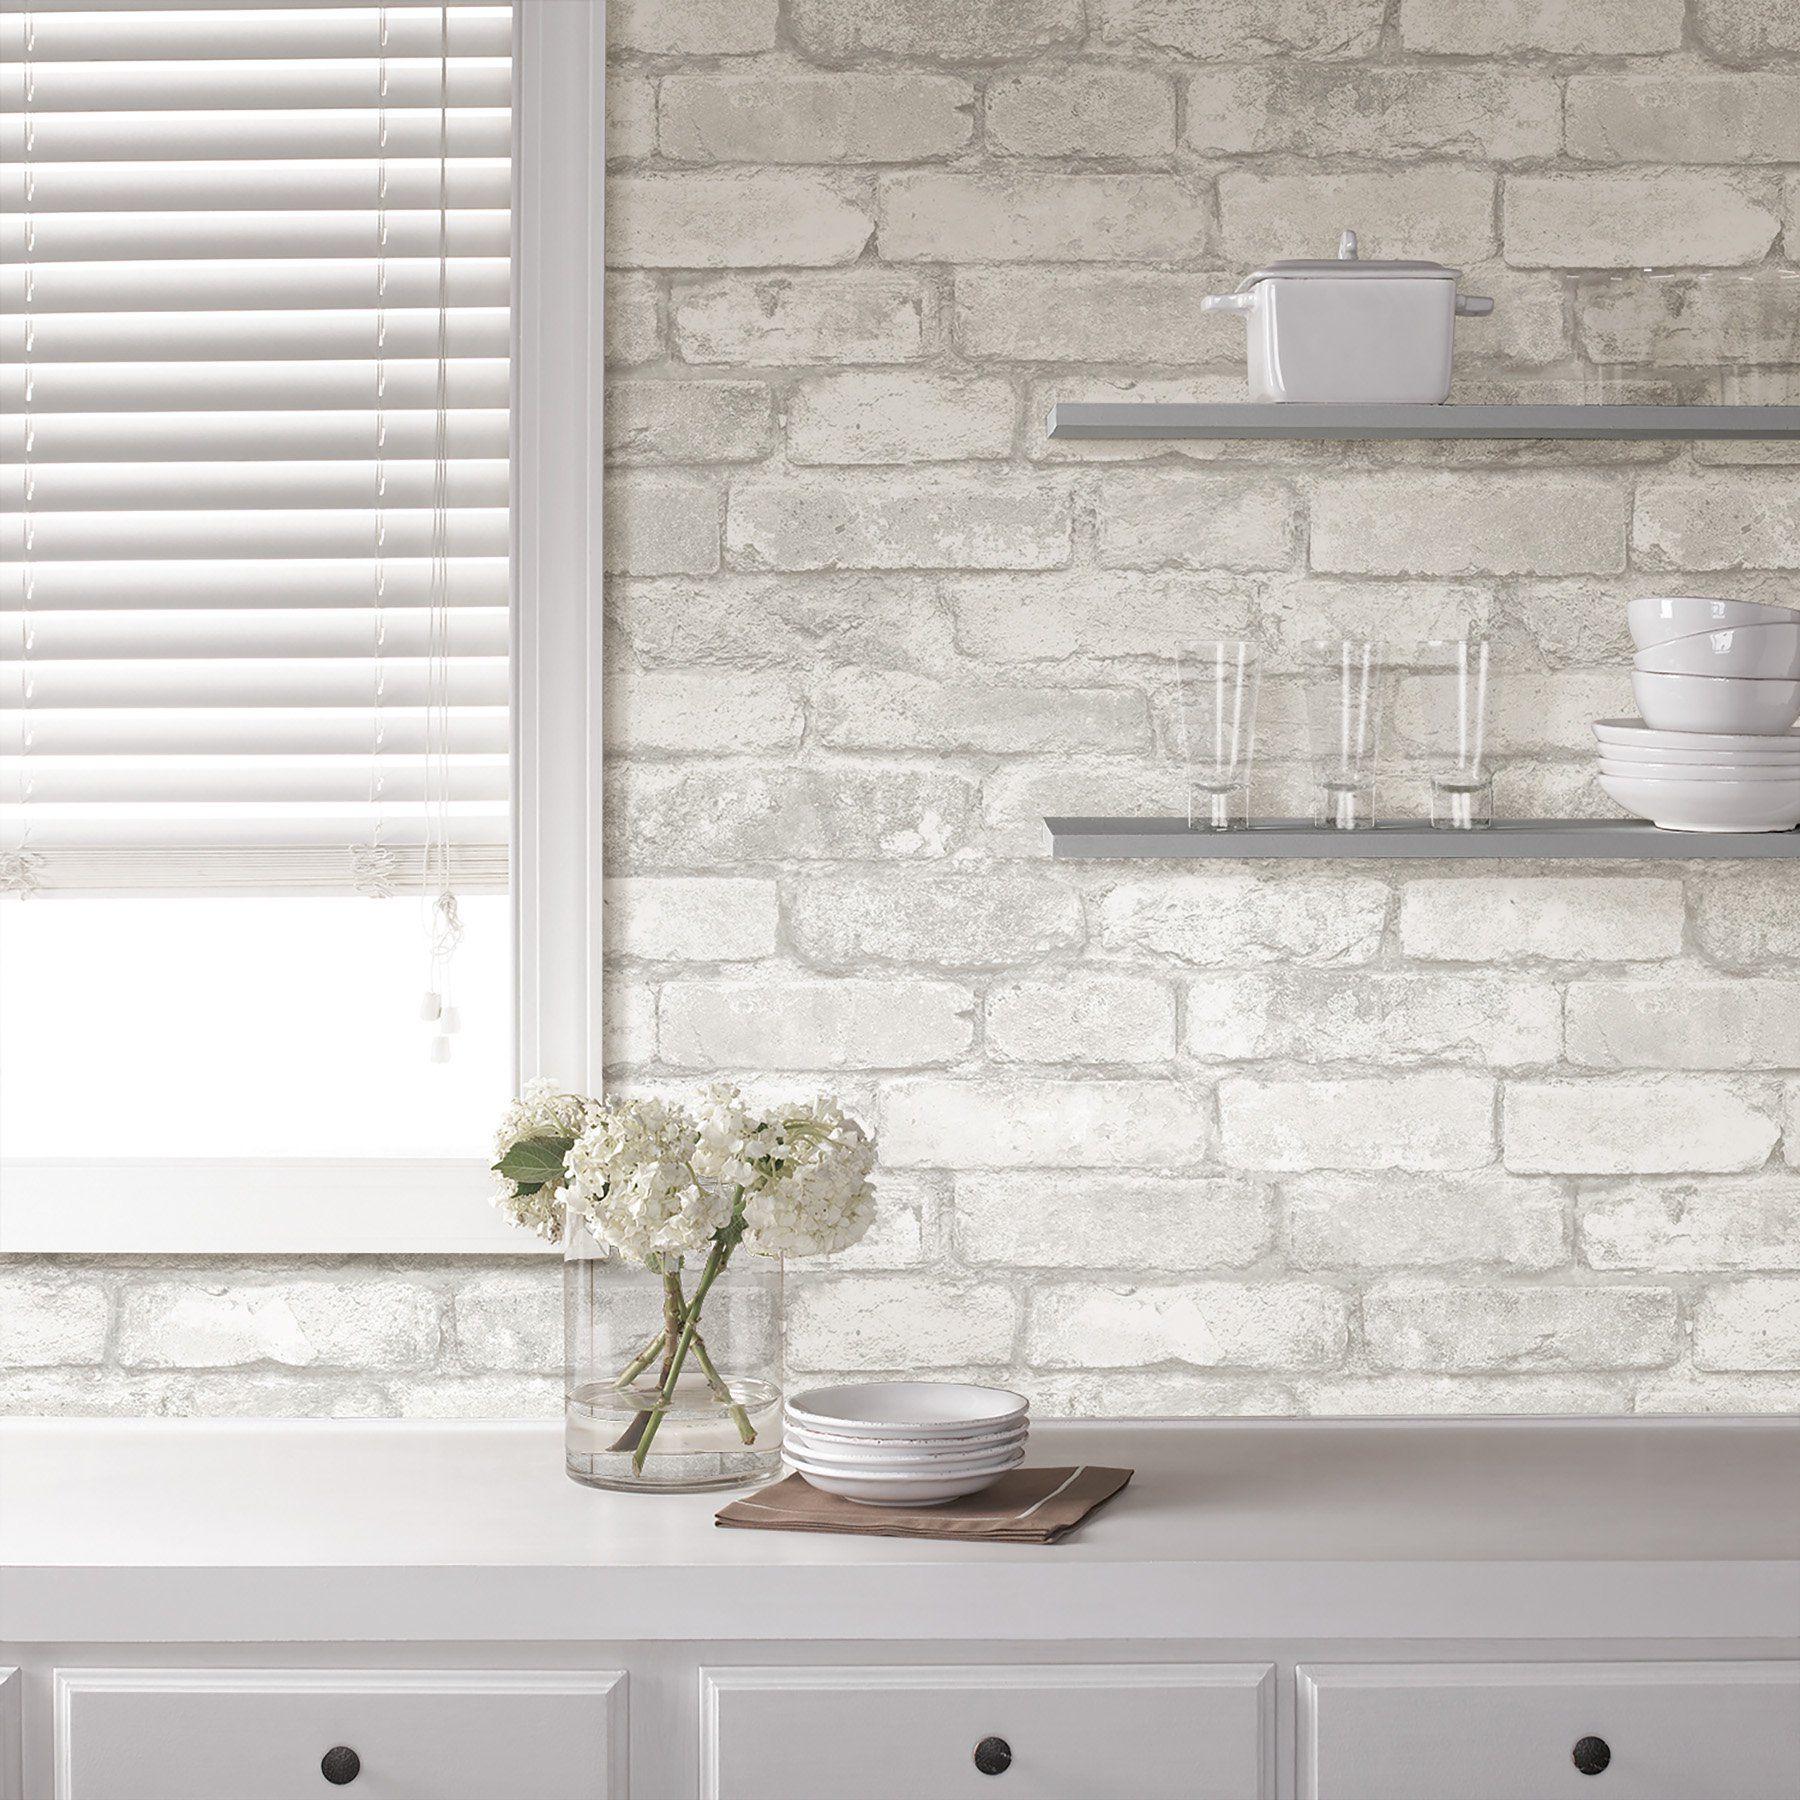 Nuwallpaper Grey And White Brick Peel Stick Wallpaper Walmart Com White Brick Backsplash Kitchen Wallpaper Brick Wallpaper